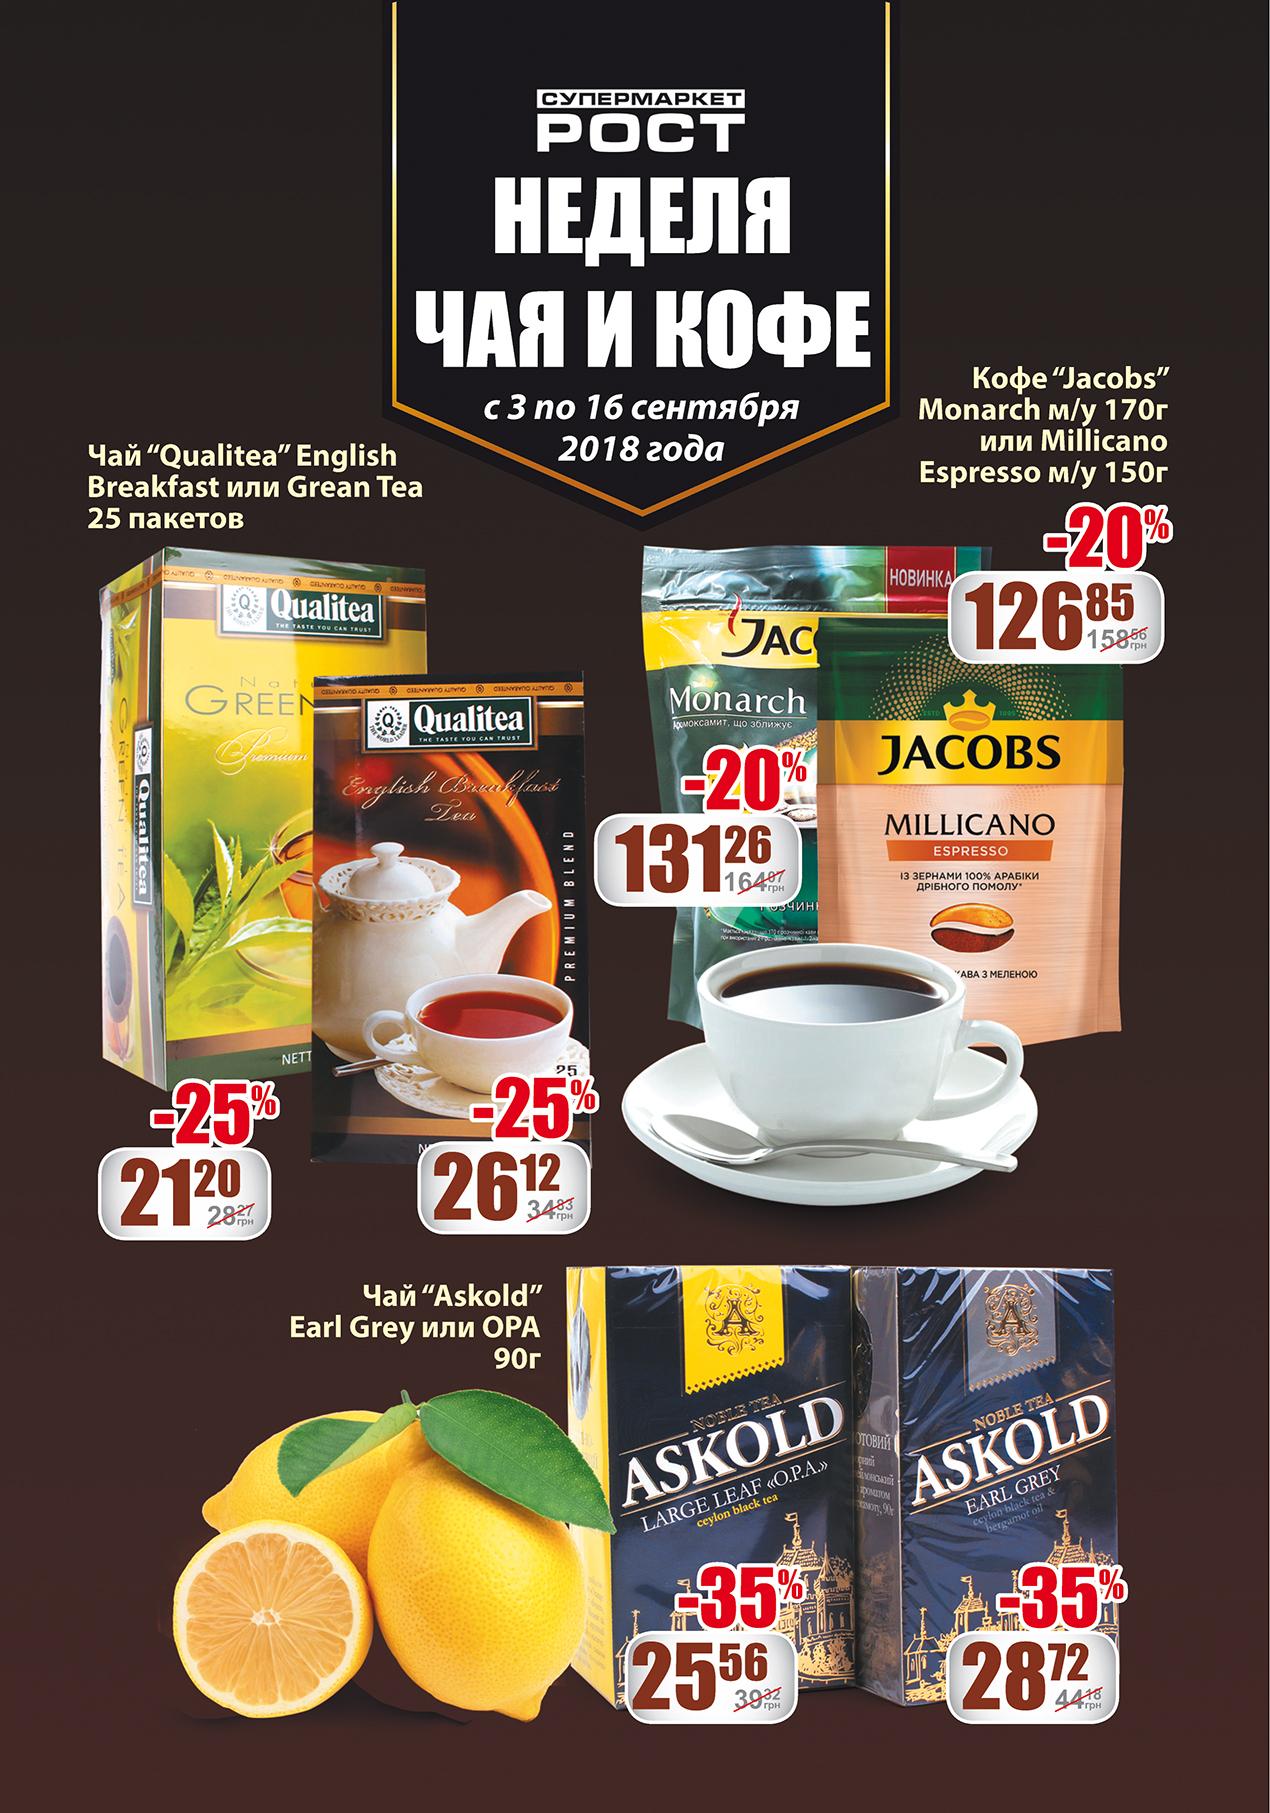 tea_coffe_3-16_print_page1